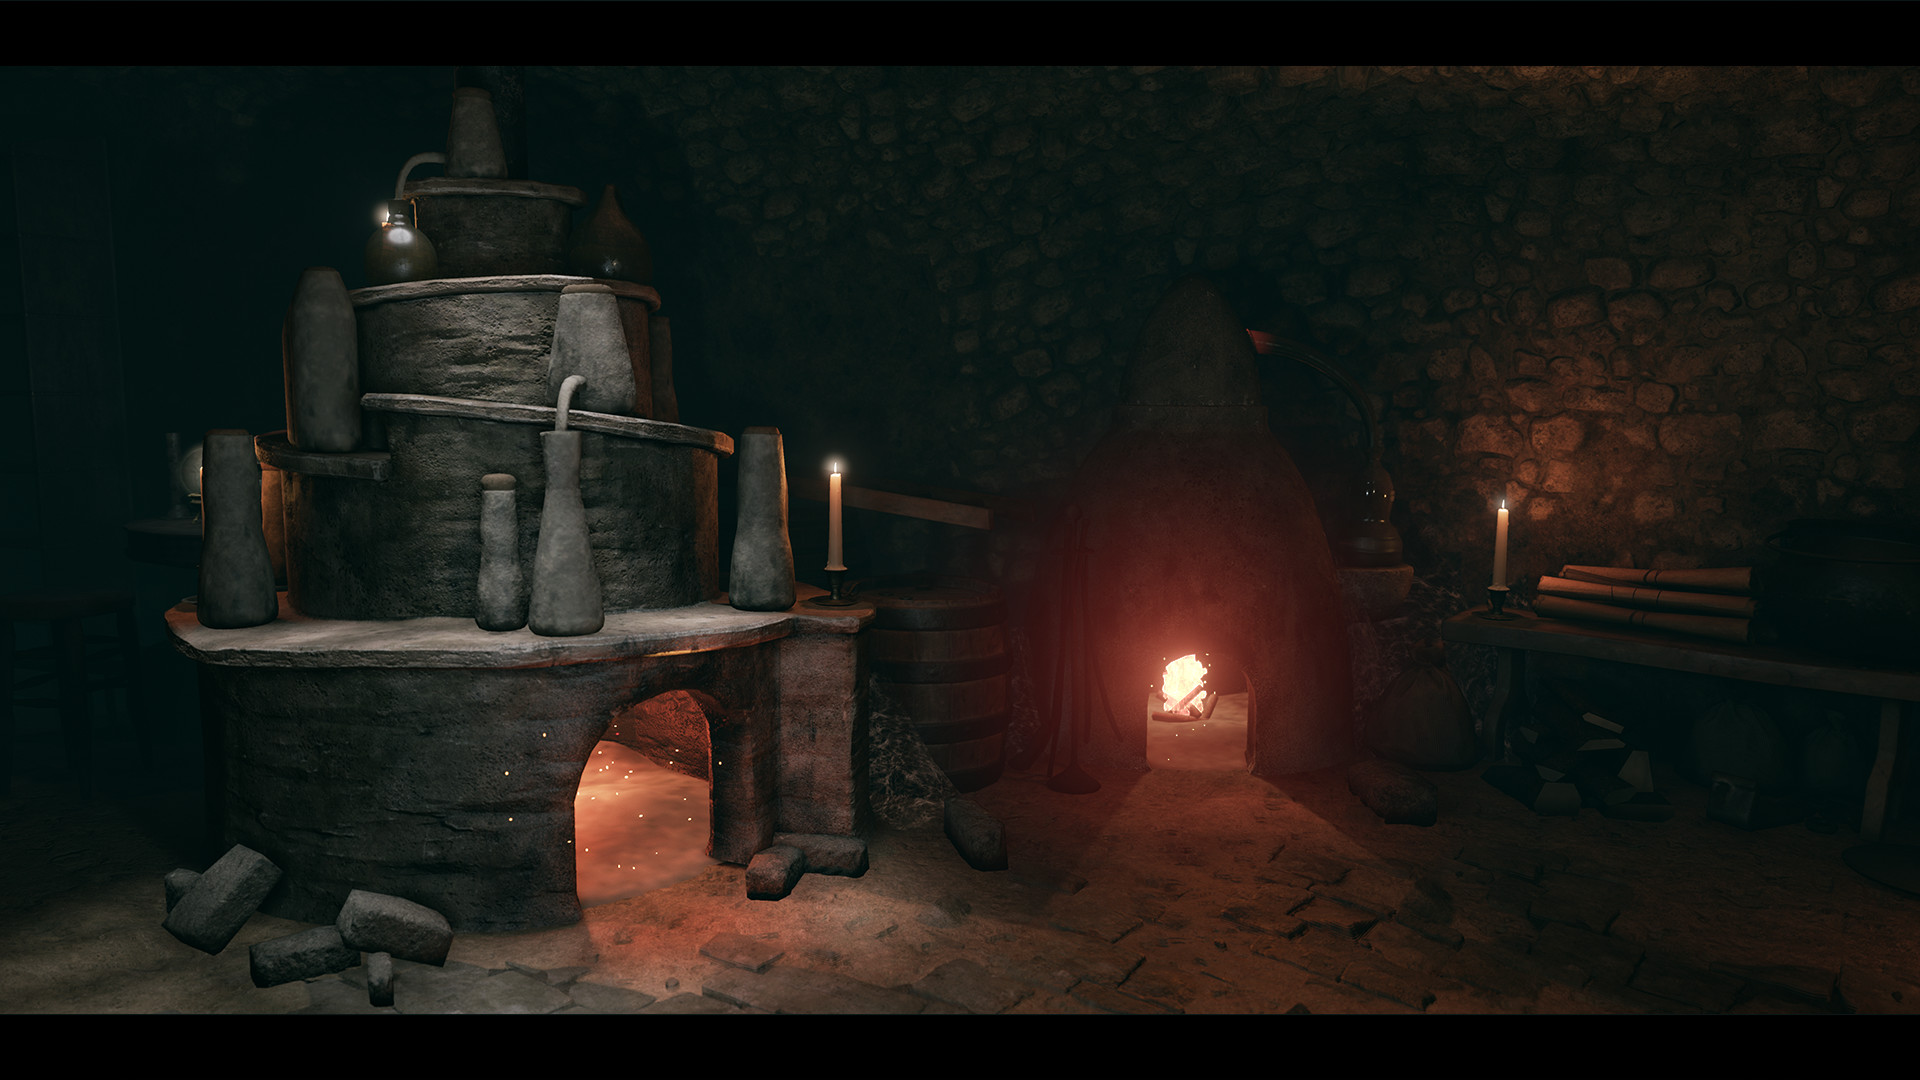 Marco maria rossi store oldalchemist screenshot 3